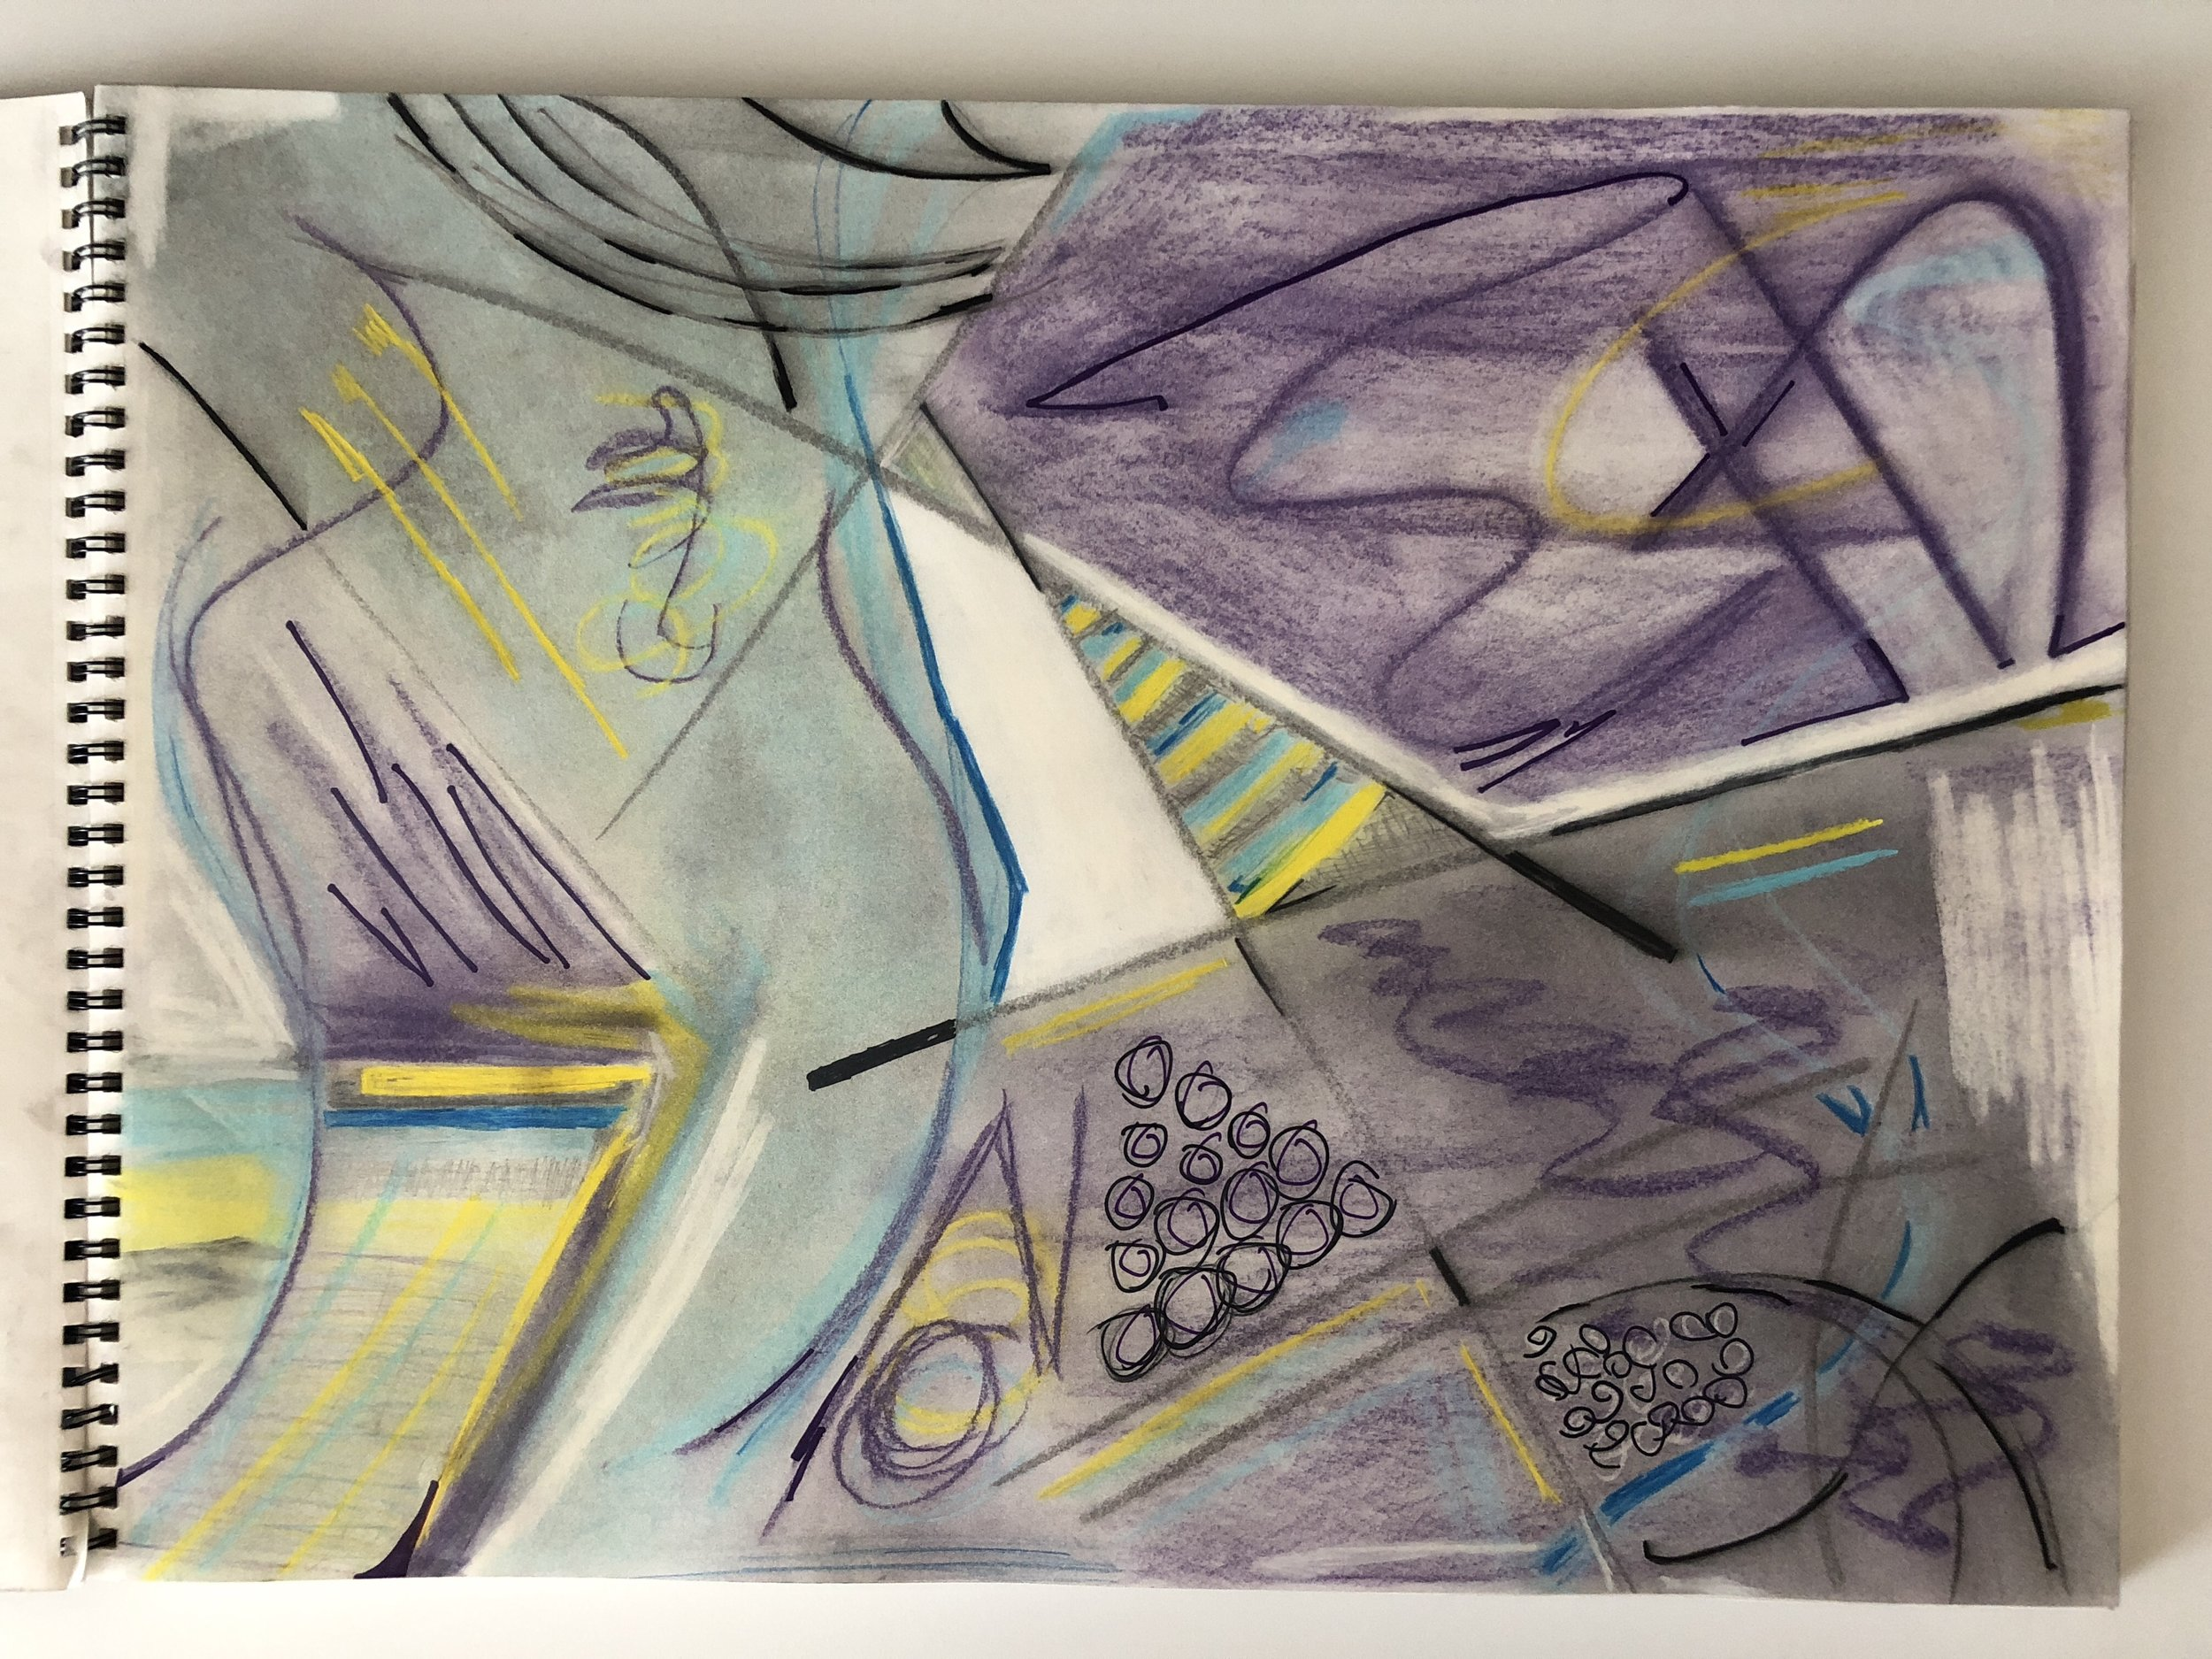 Mark's abstract art, week 2